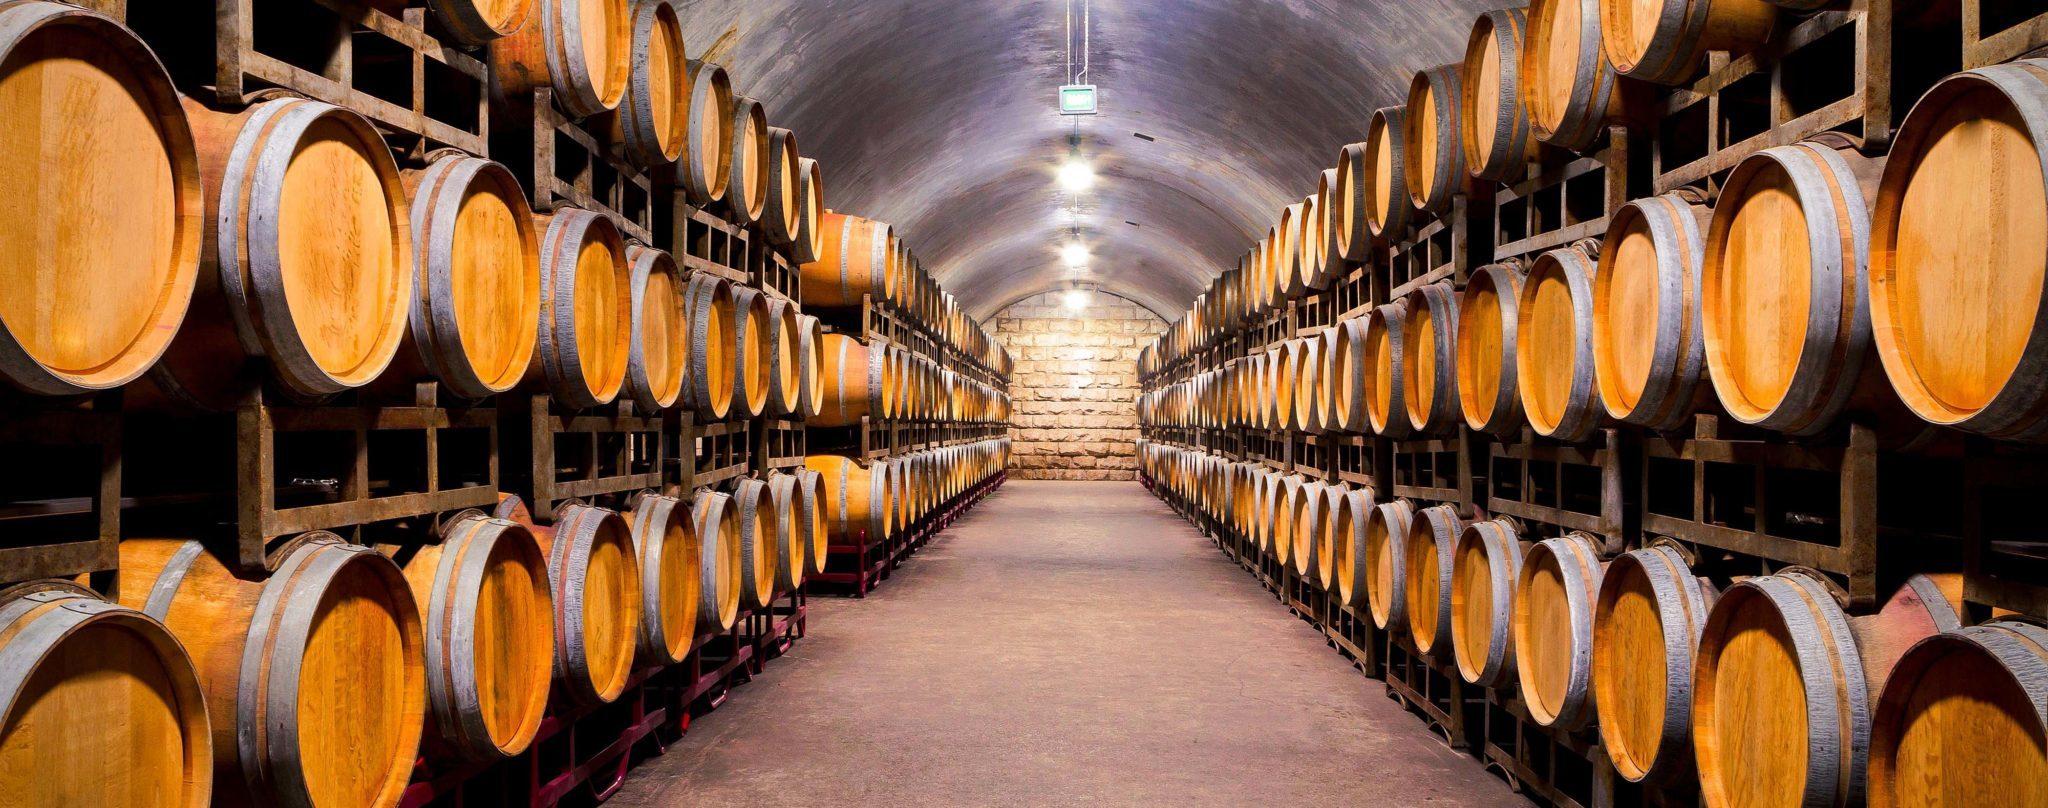 tuscany wineries - chianti montepulciano montalcino - Best wineries in Chianti Siena Tuscany